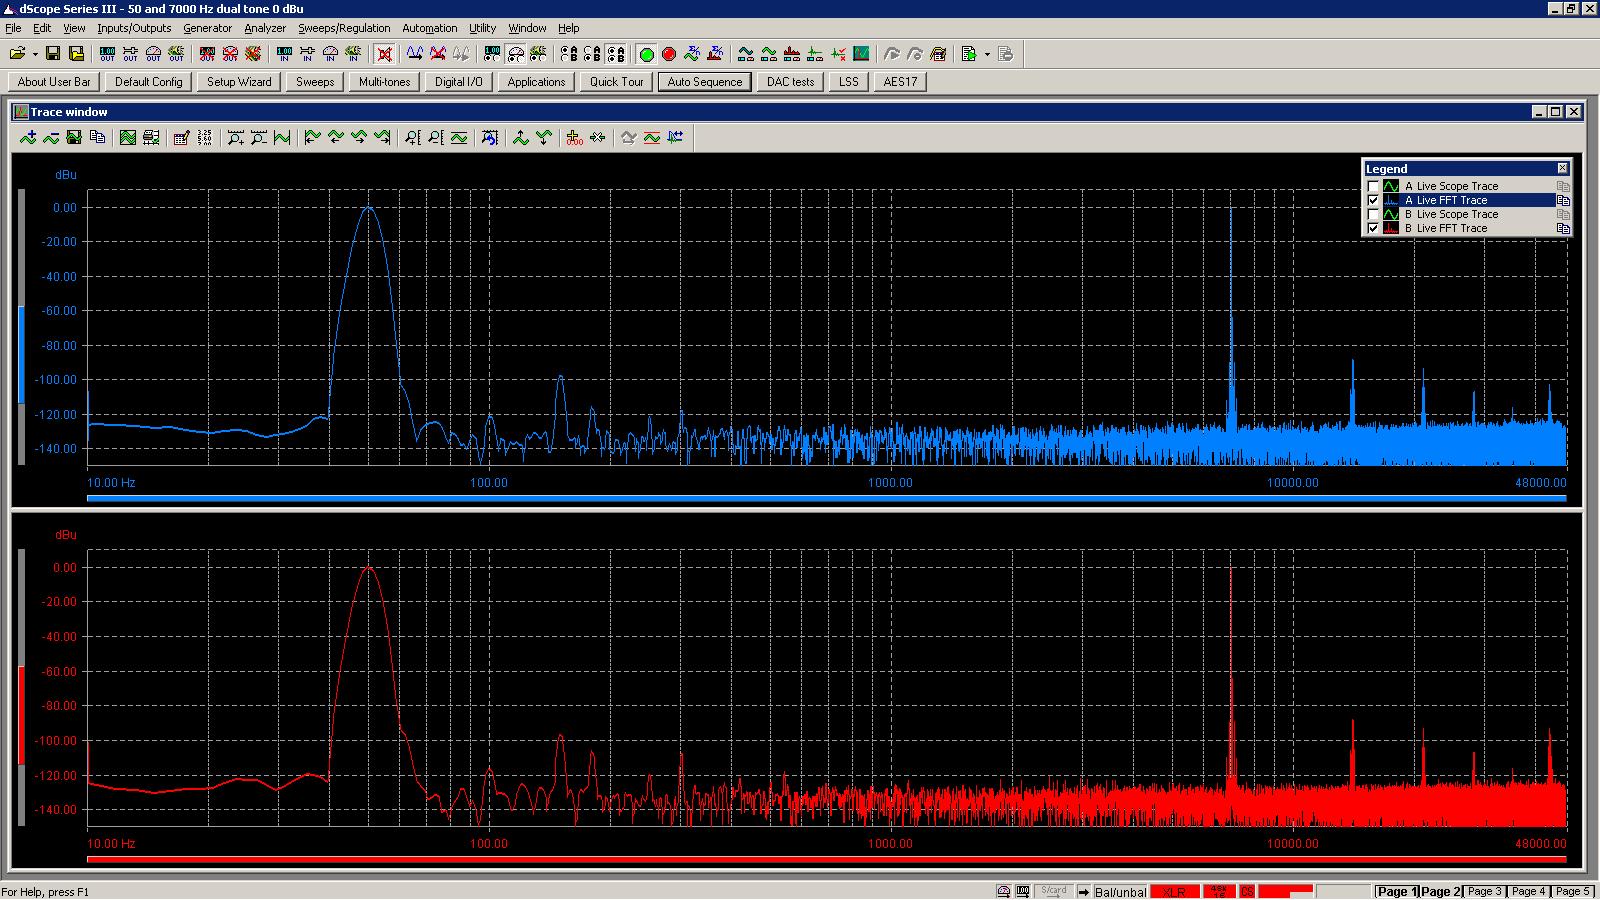 20160905 Jotunheim 50+7000Hz dual tone 0dBu 30R Bal.png